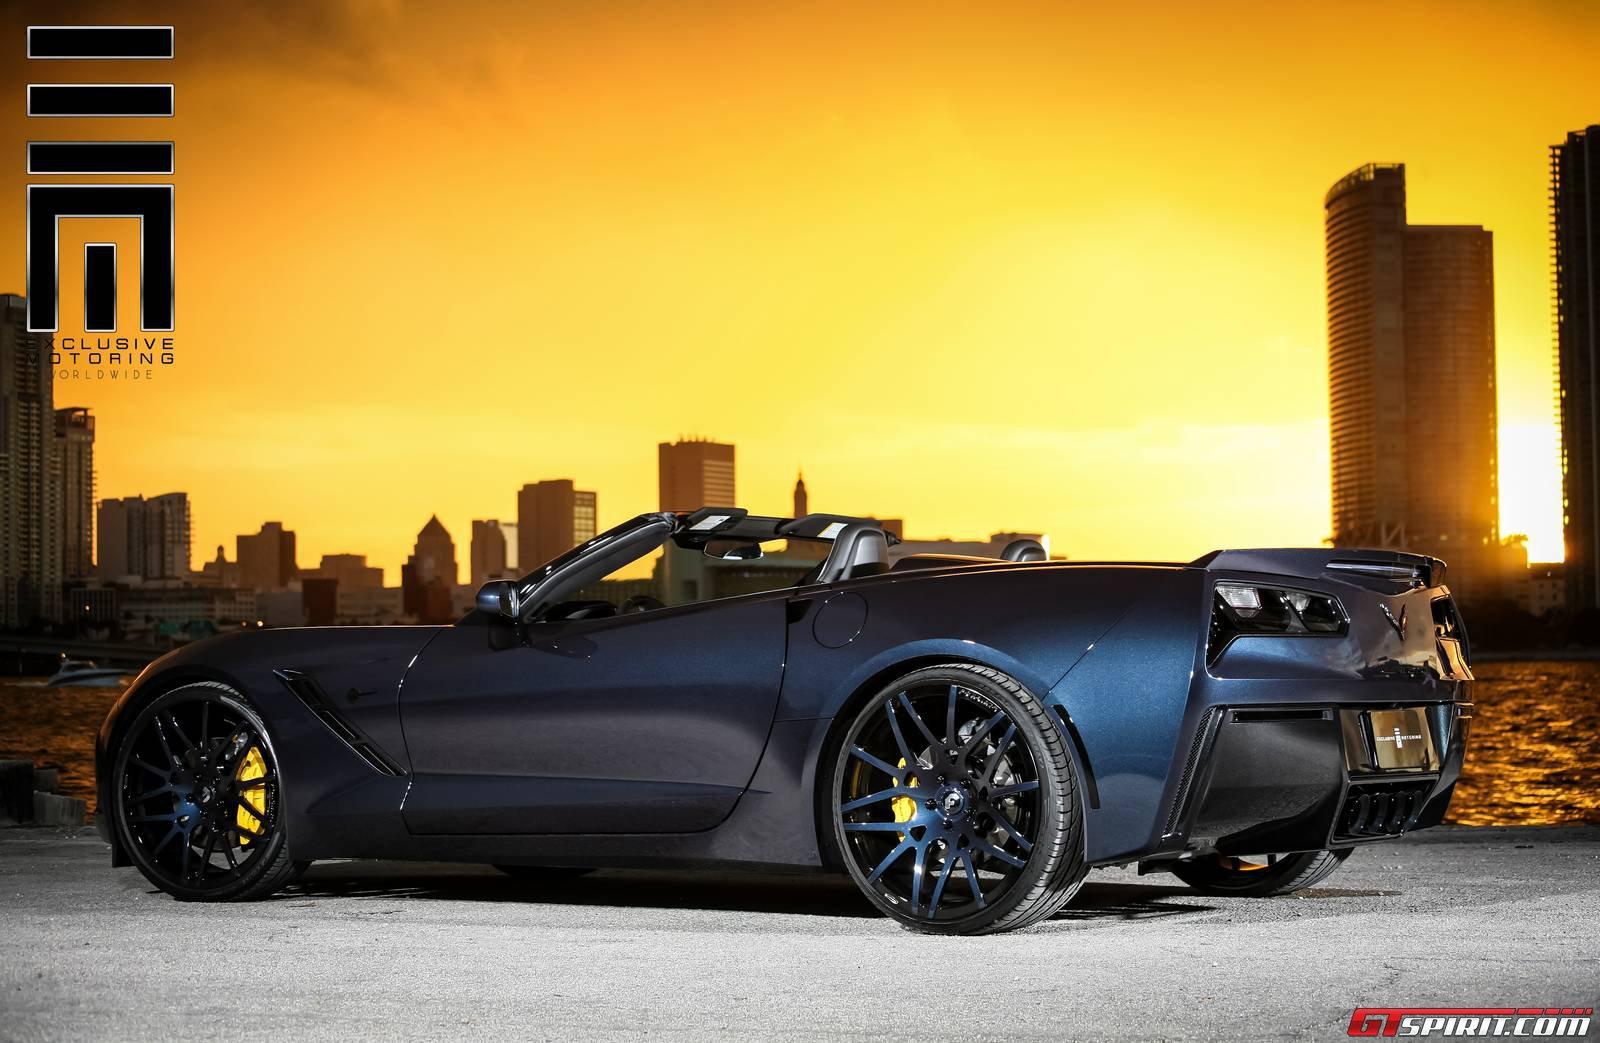 2014 chevrolet corvette stingray convertible by exclusive